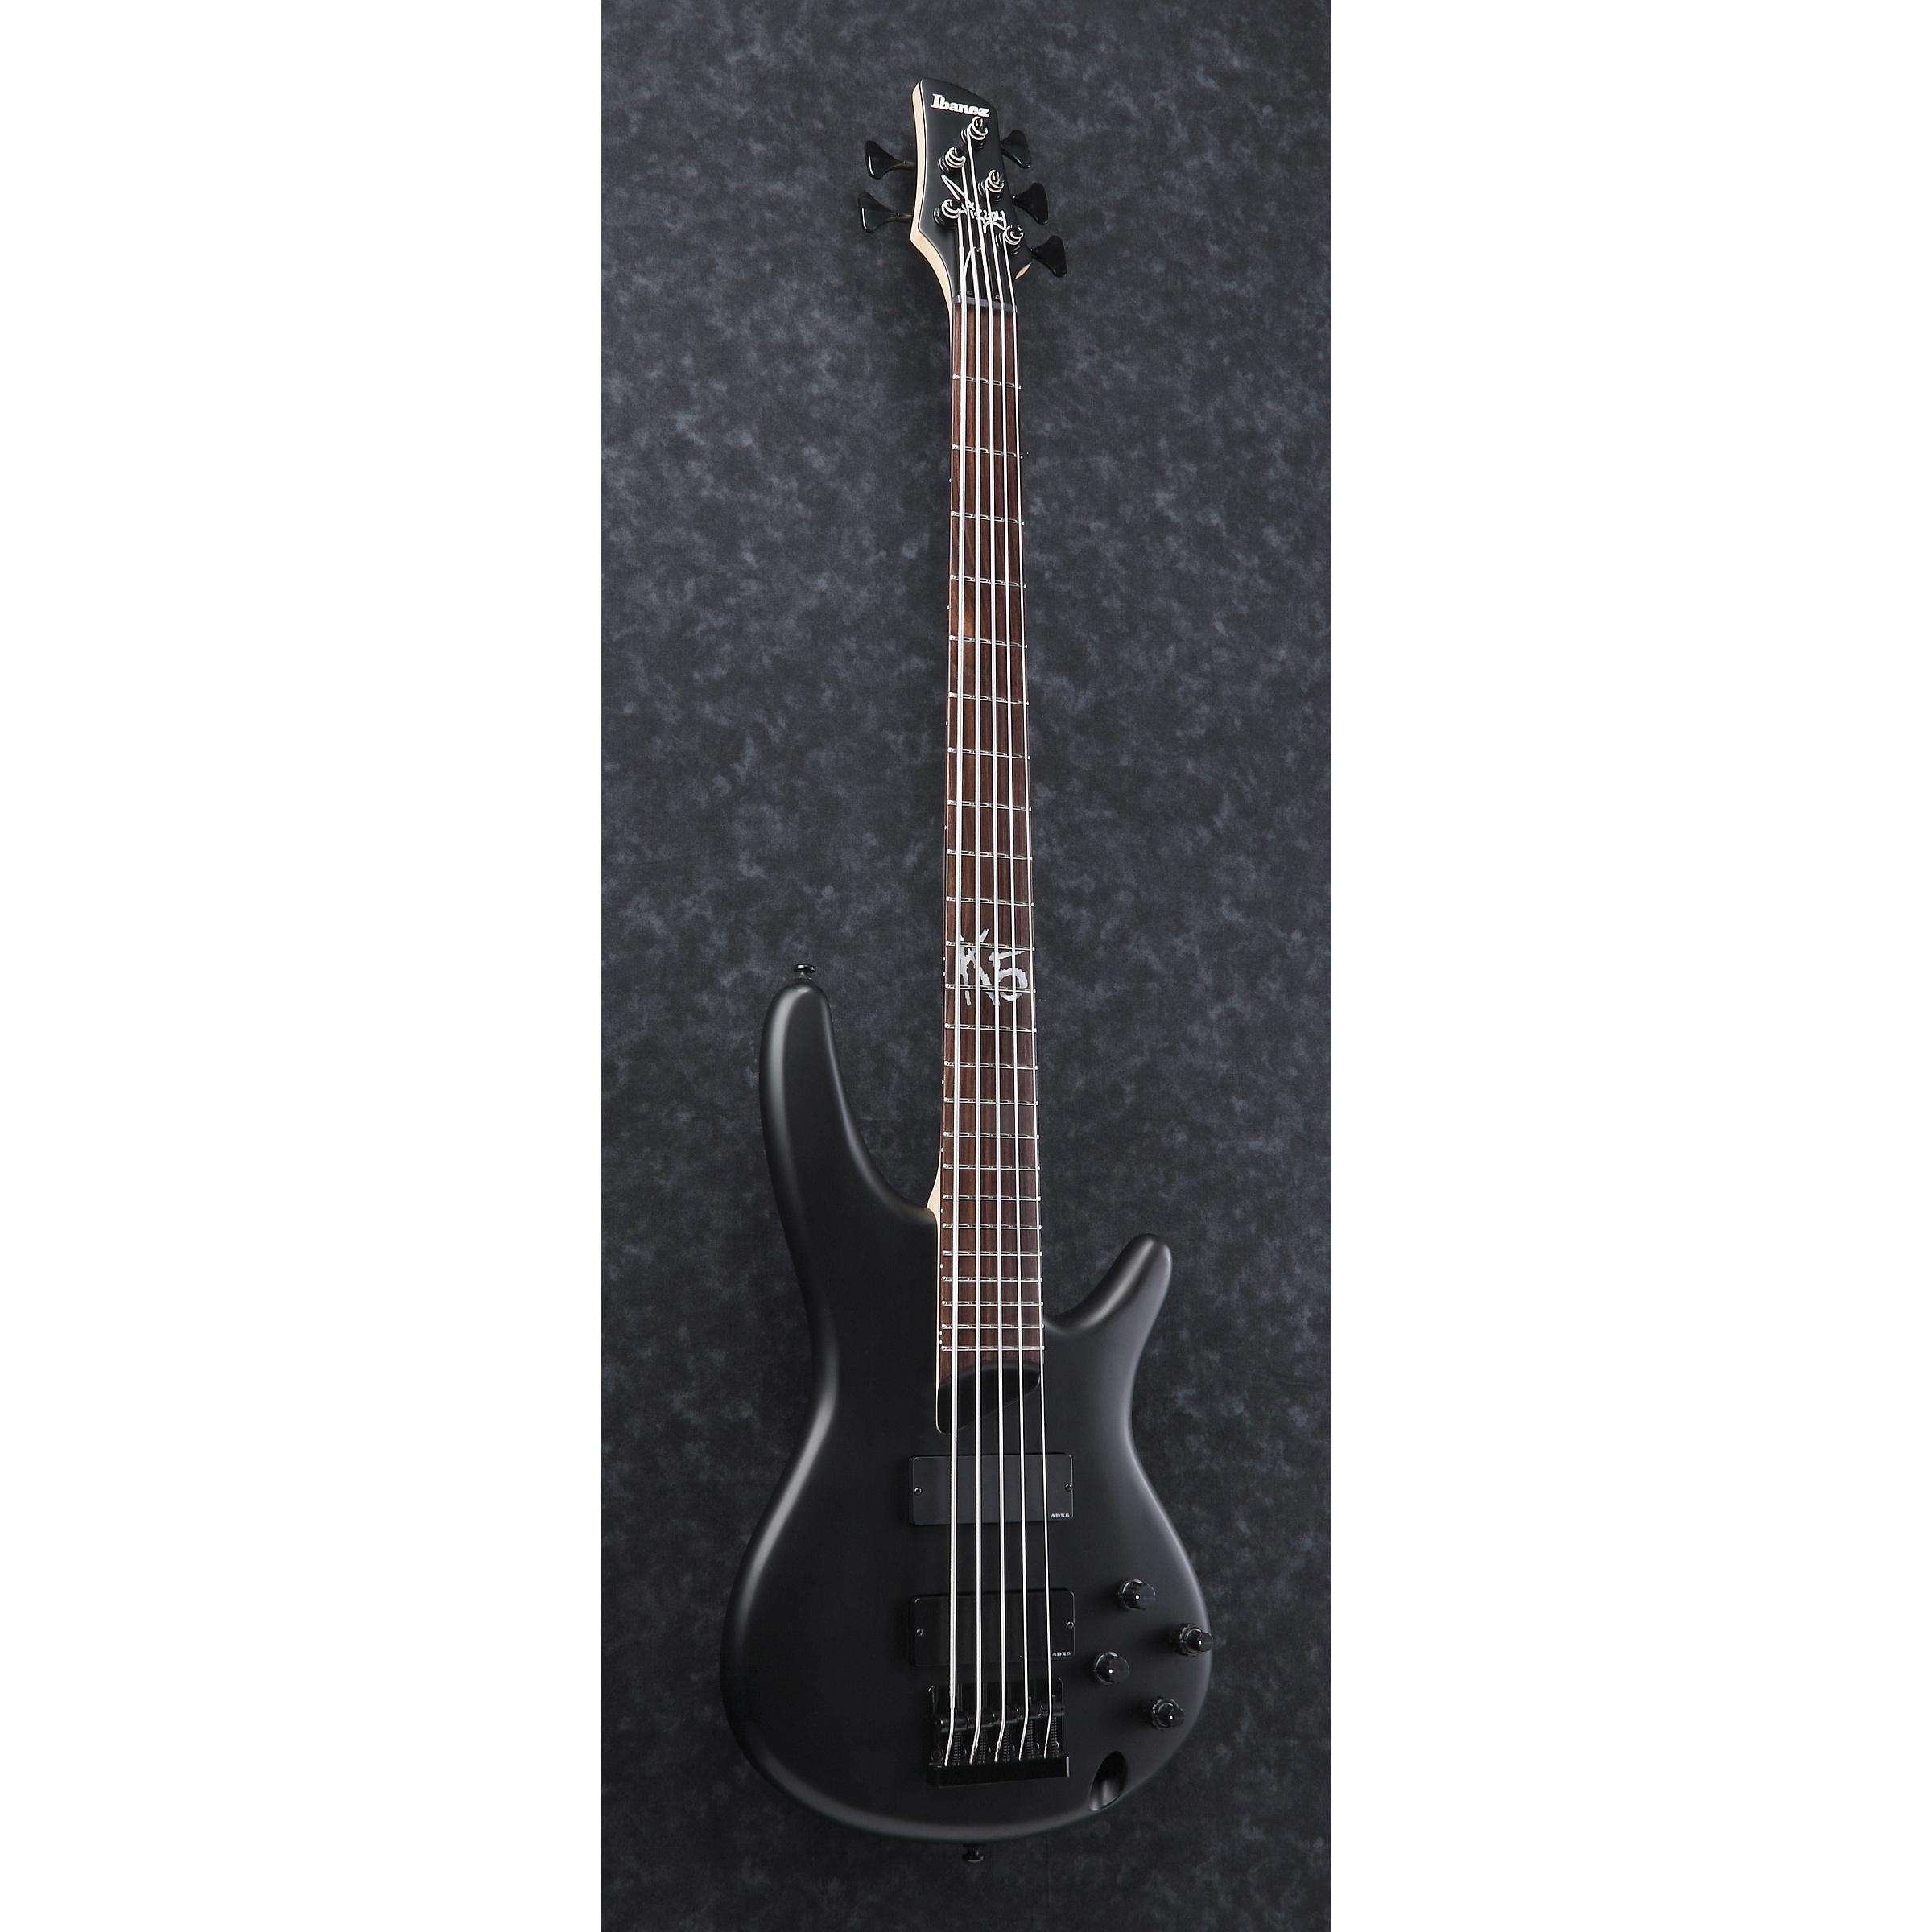 IBANEZ K5 Fieldy Signature E-Bass 5 String Black Flat -B-Stock-